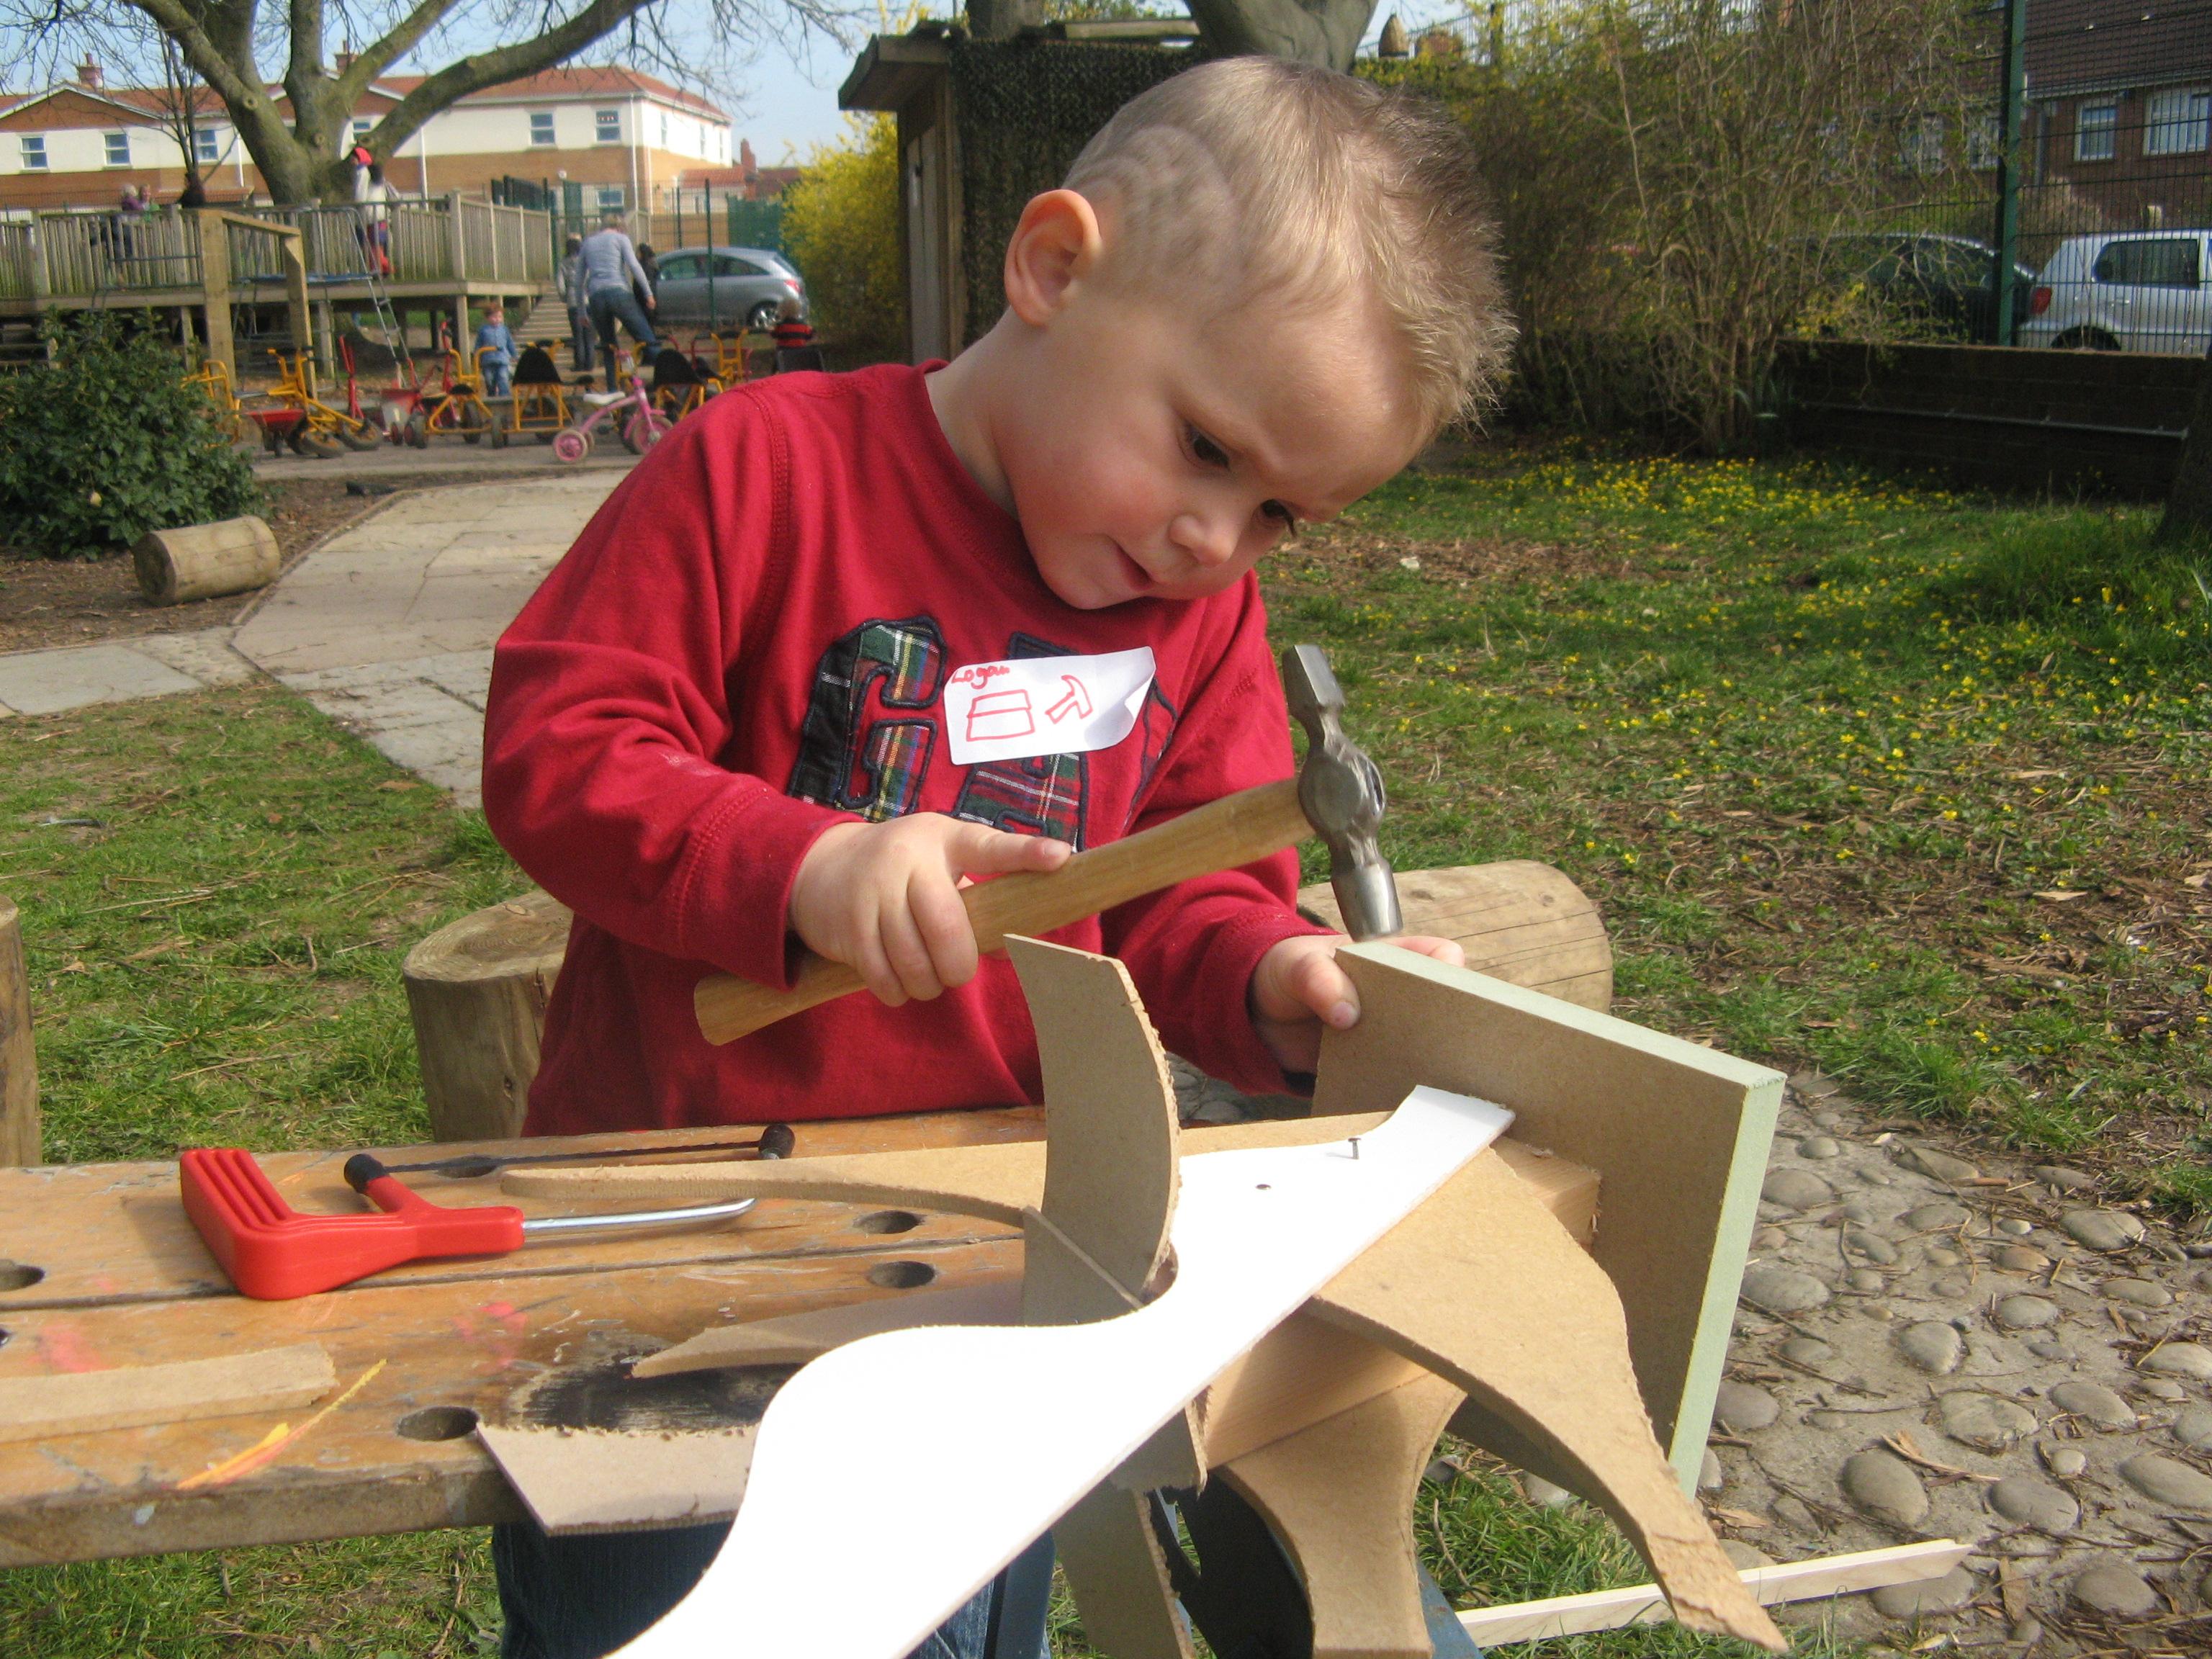 Woodwork Woodworking For Children Plans